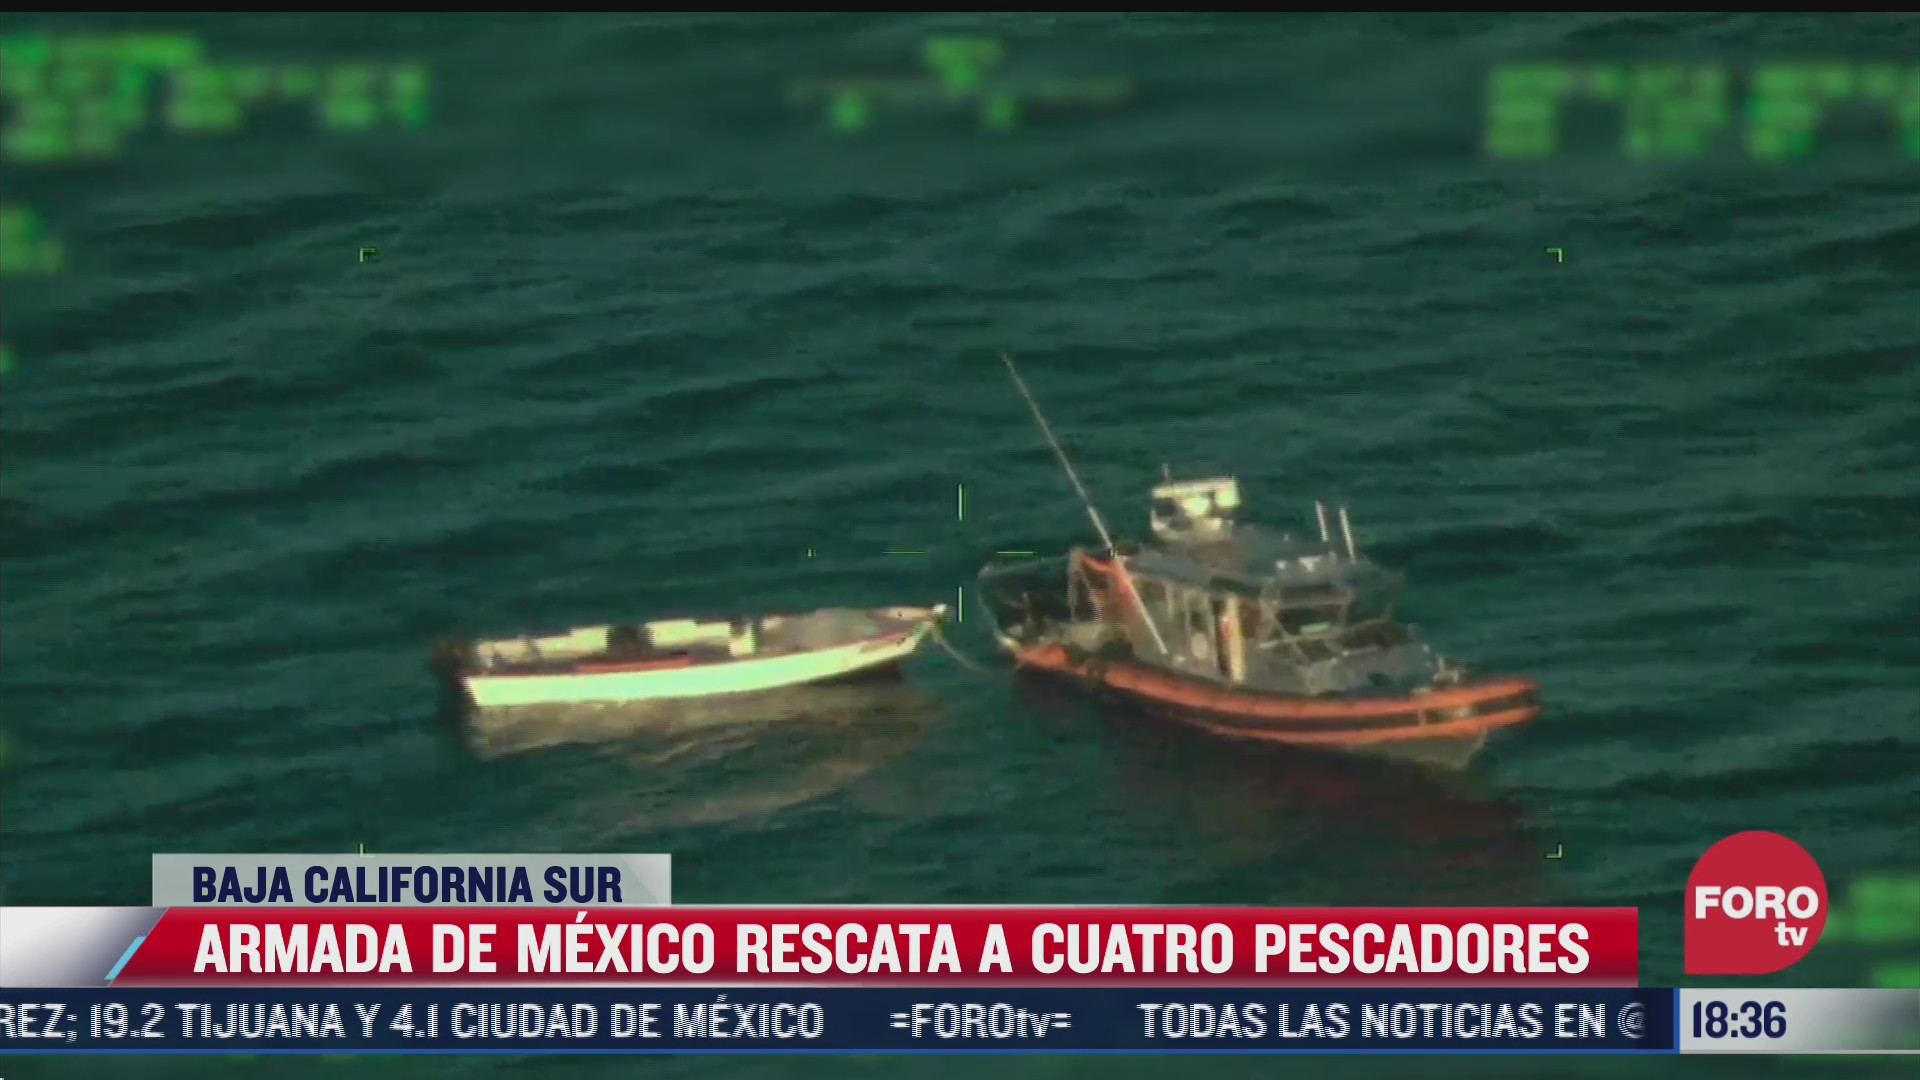 rescatan a cuatro pescadores naufragos en baja california sur